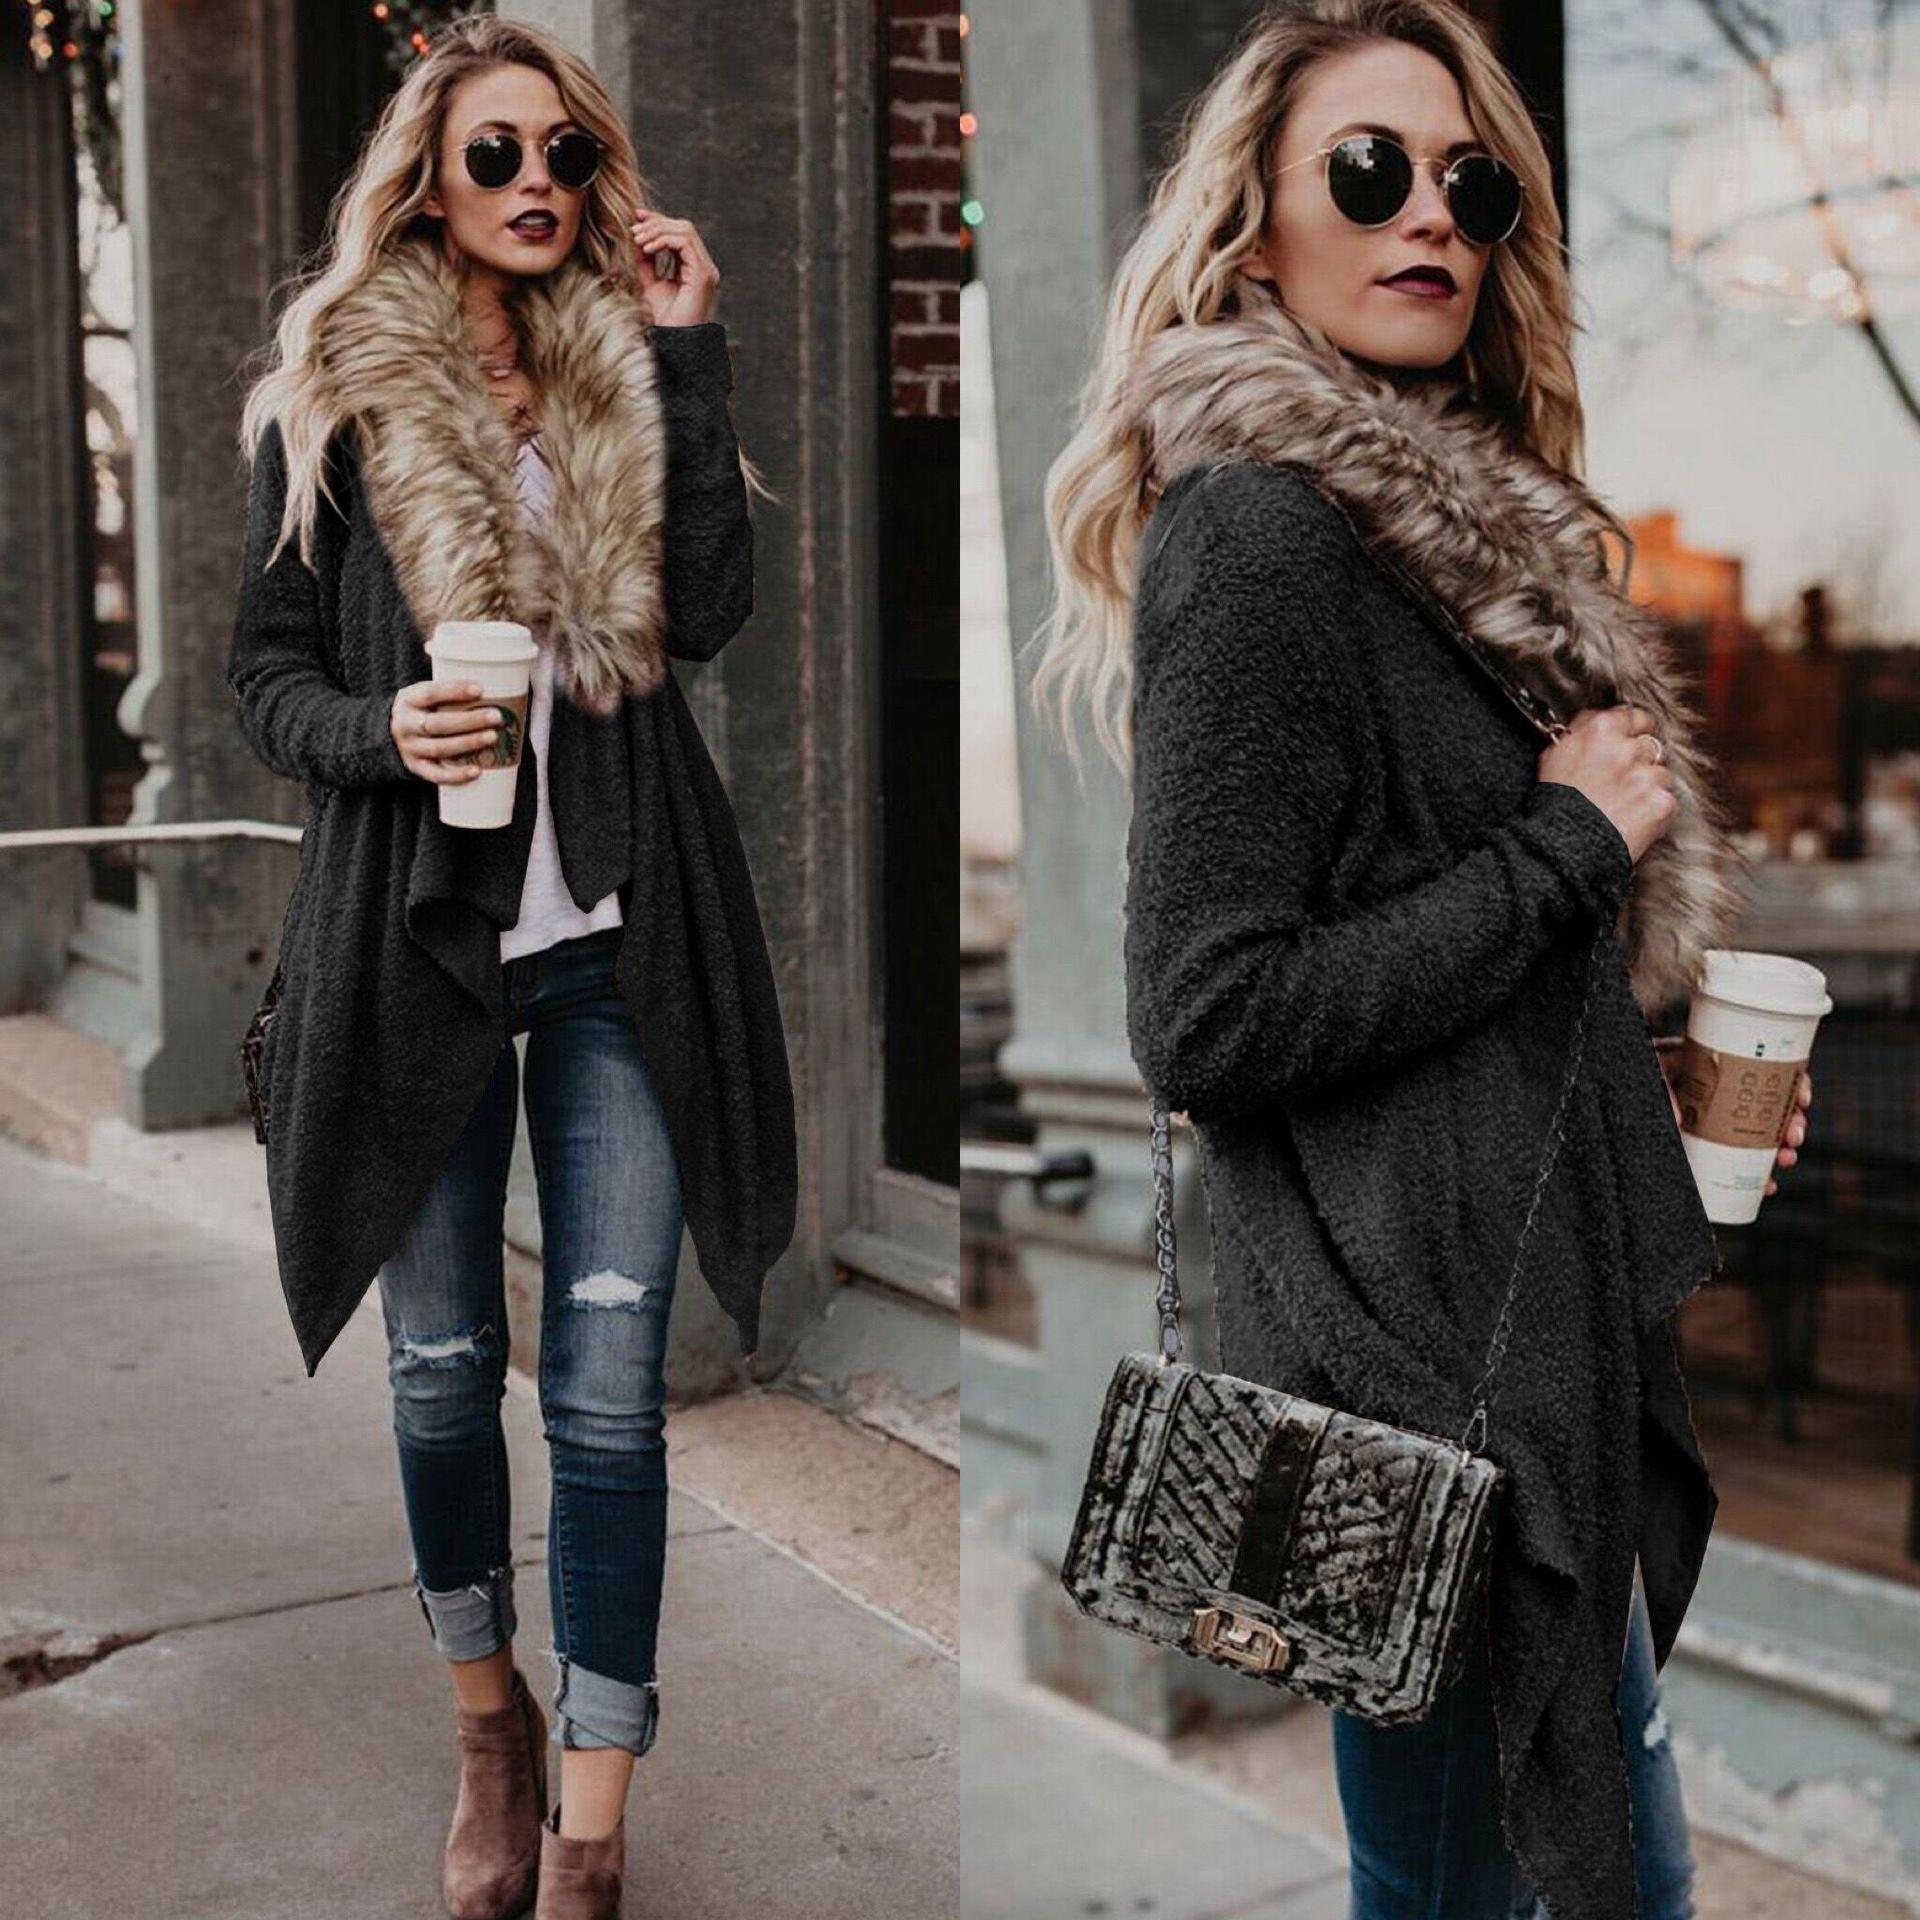 d033f018c678 2019 Wholesale 2018 New Style Women Cardigan With Fur Collar Plush  Windbreaker Women Sweaters Street Style Lapel Personality Designer Sweater  From Szghhcool ...